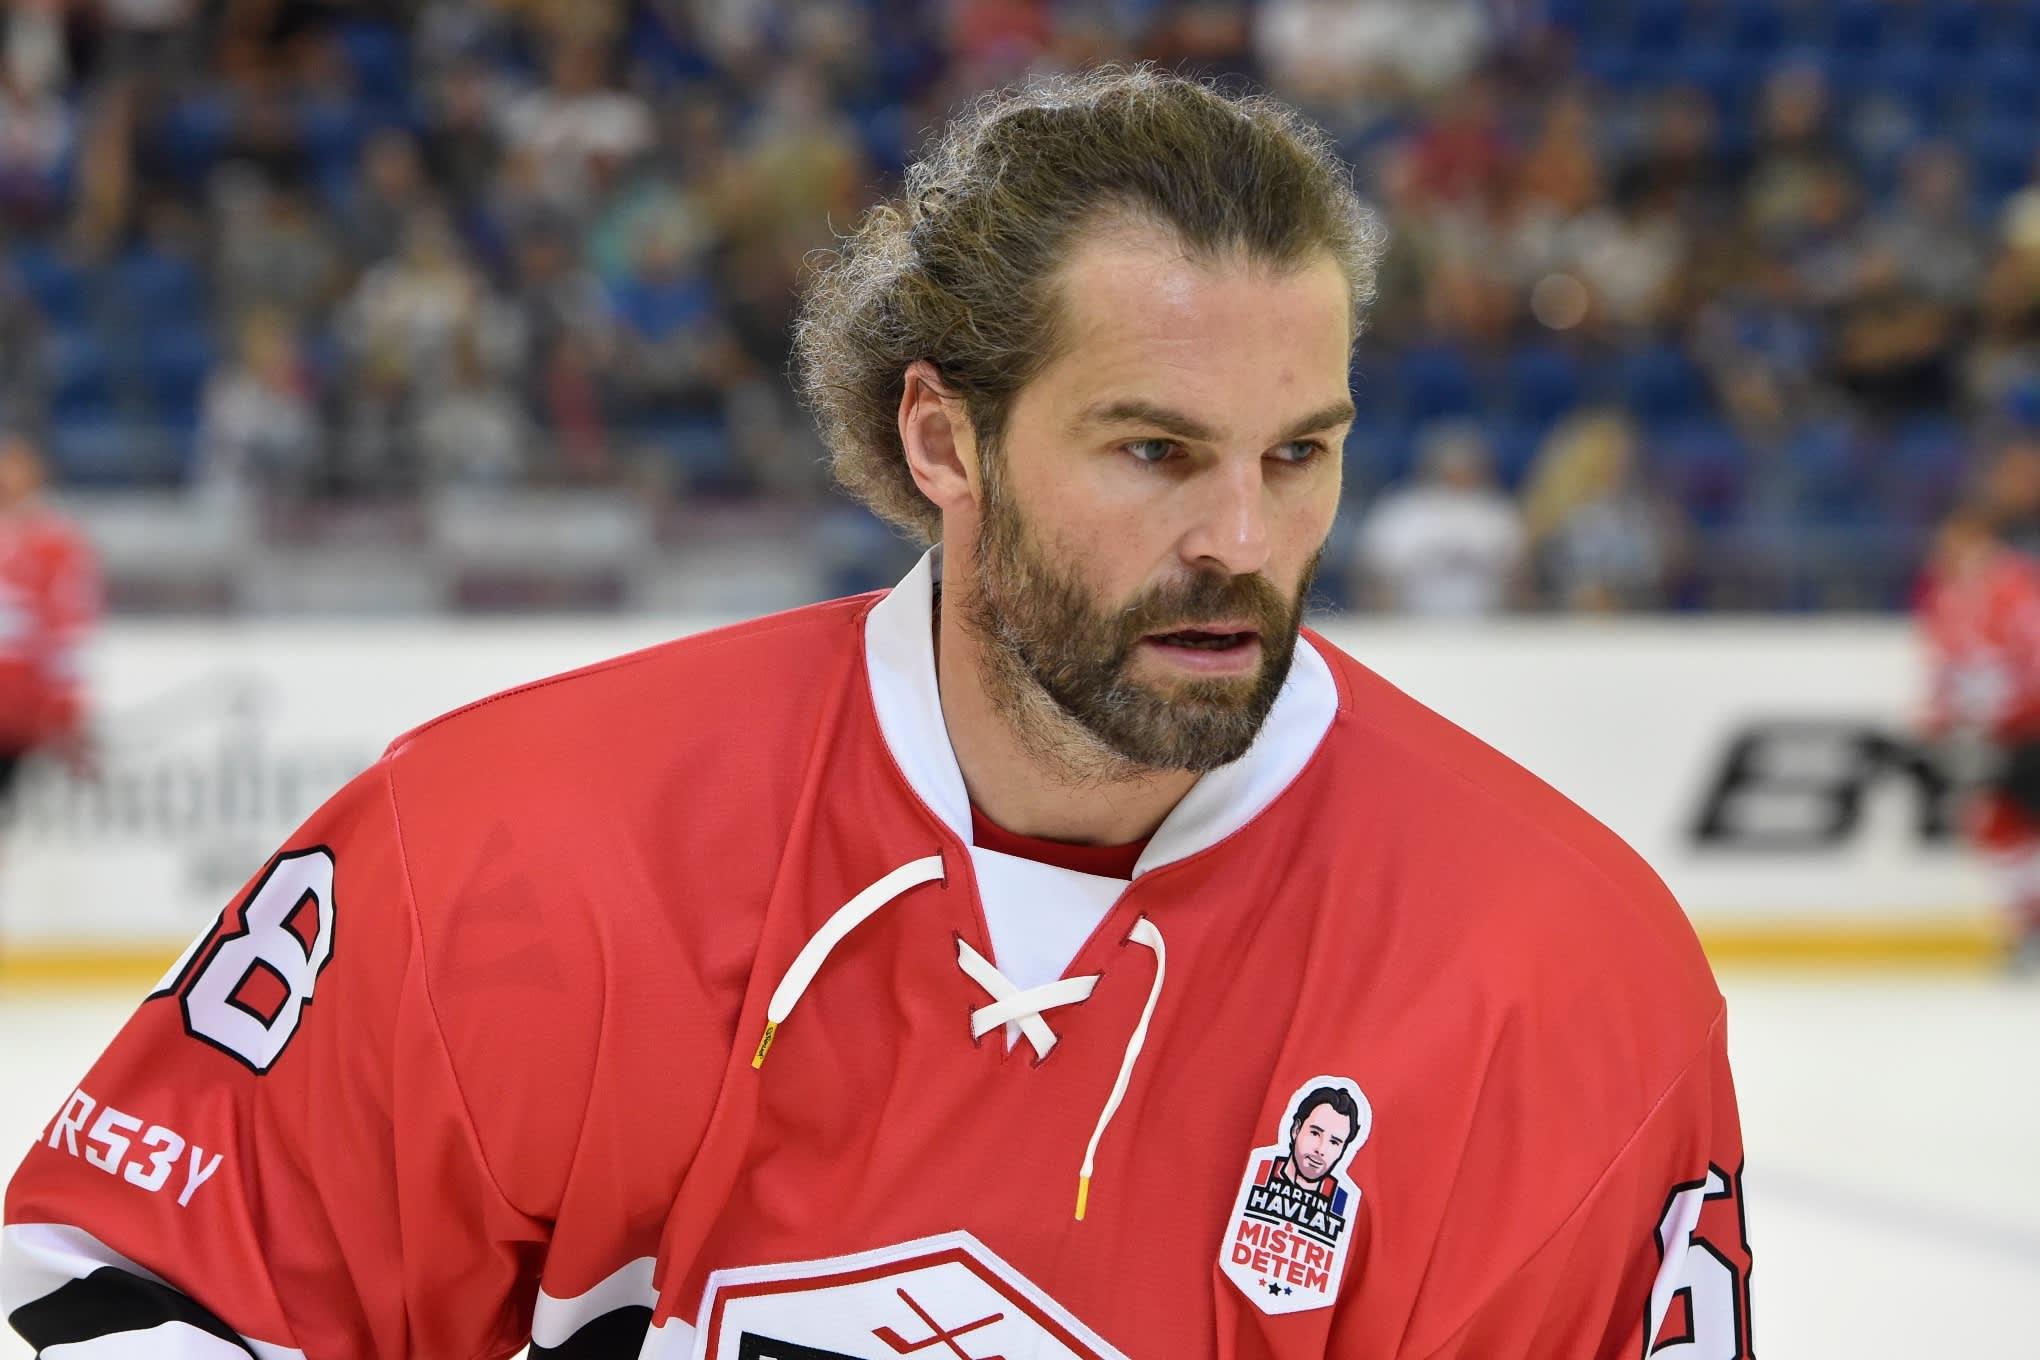 Jaromir Jagr, 45.